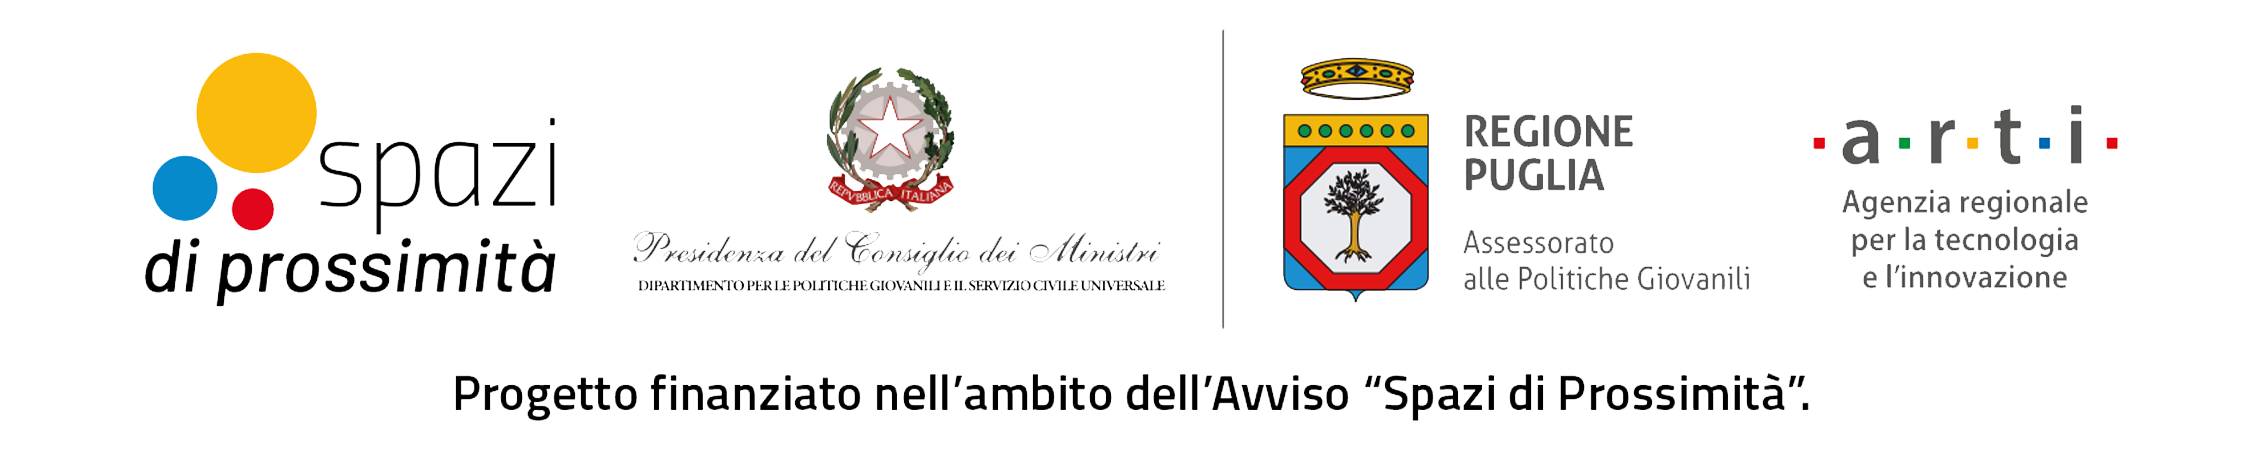 SDP_logo_e_loghi_istituzionali-trans